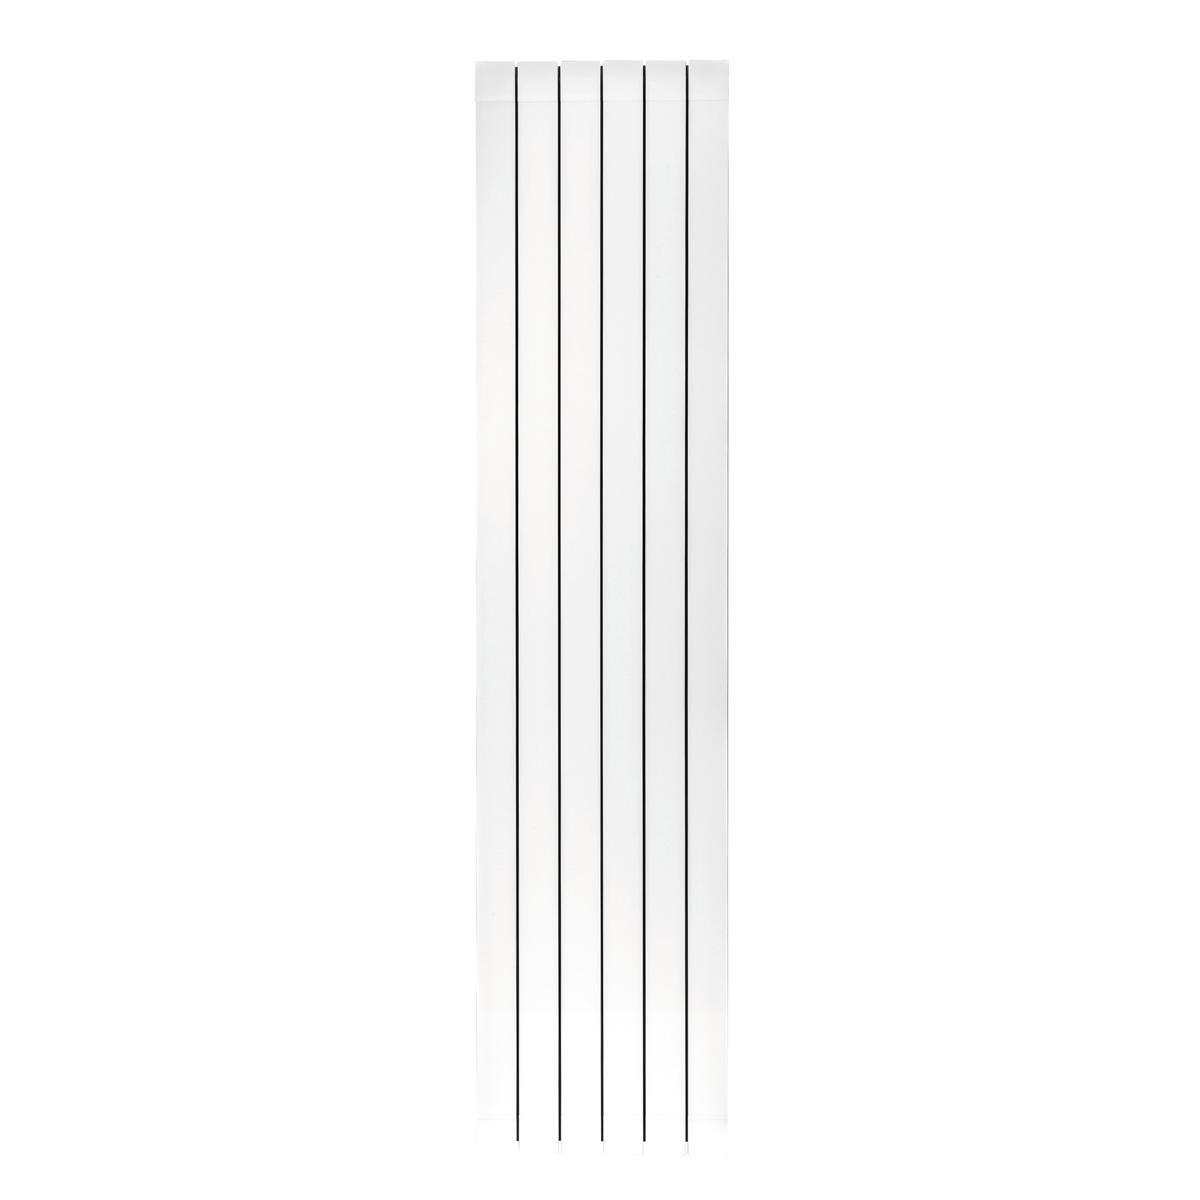 Radiatore acqua calda PRODIGE Superior in alluminio 6 elementi interasse 200 cm - 1